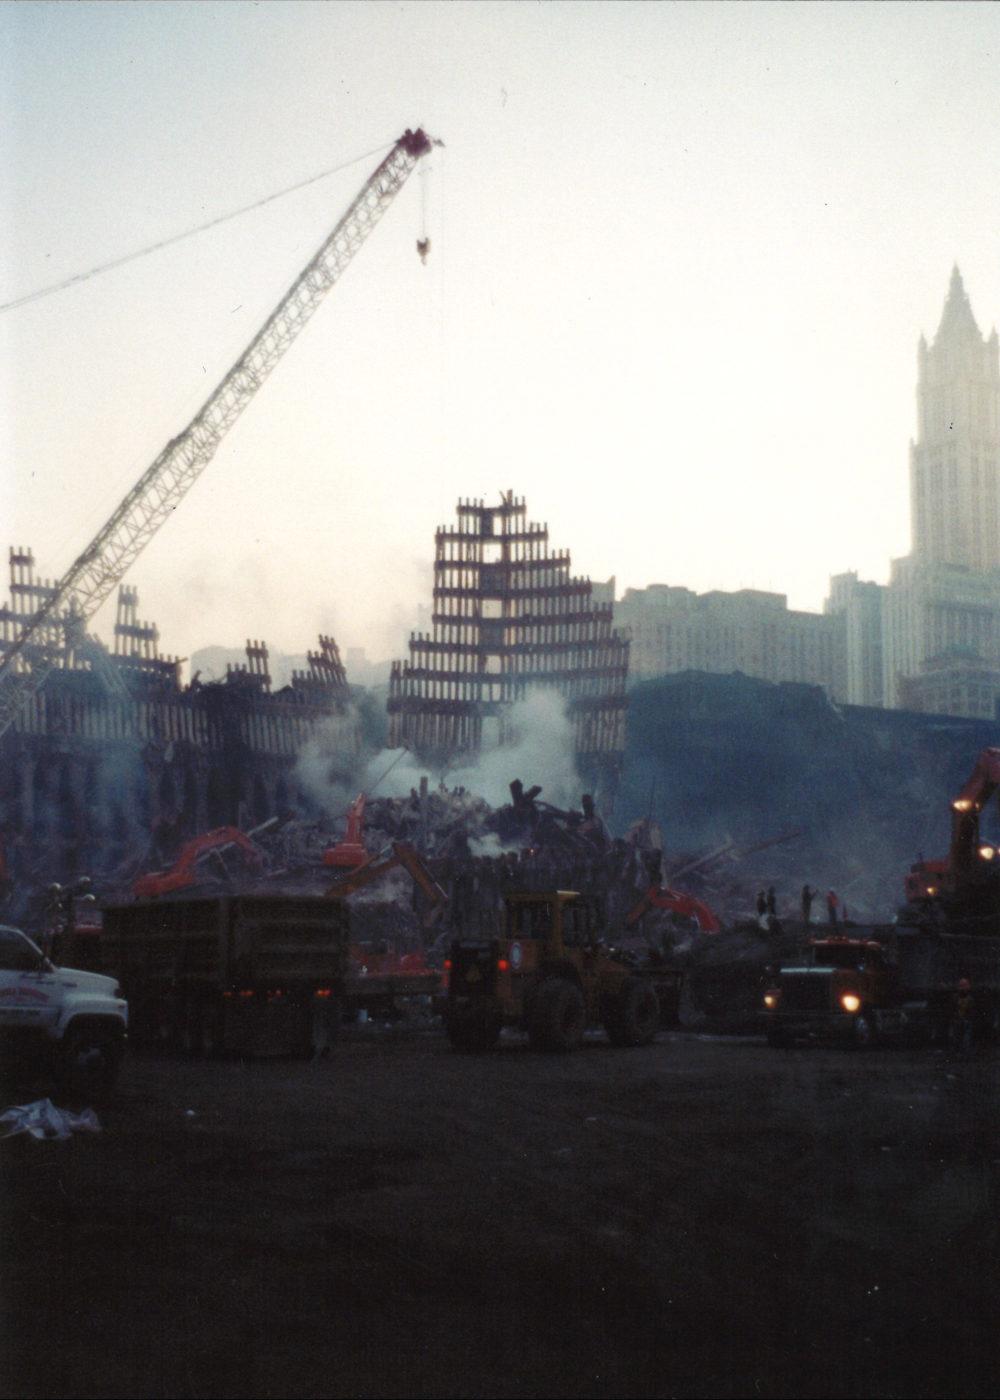 Cranes, diggers, dump trucks working late night